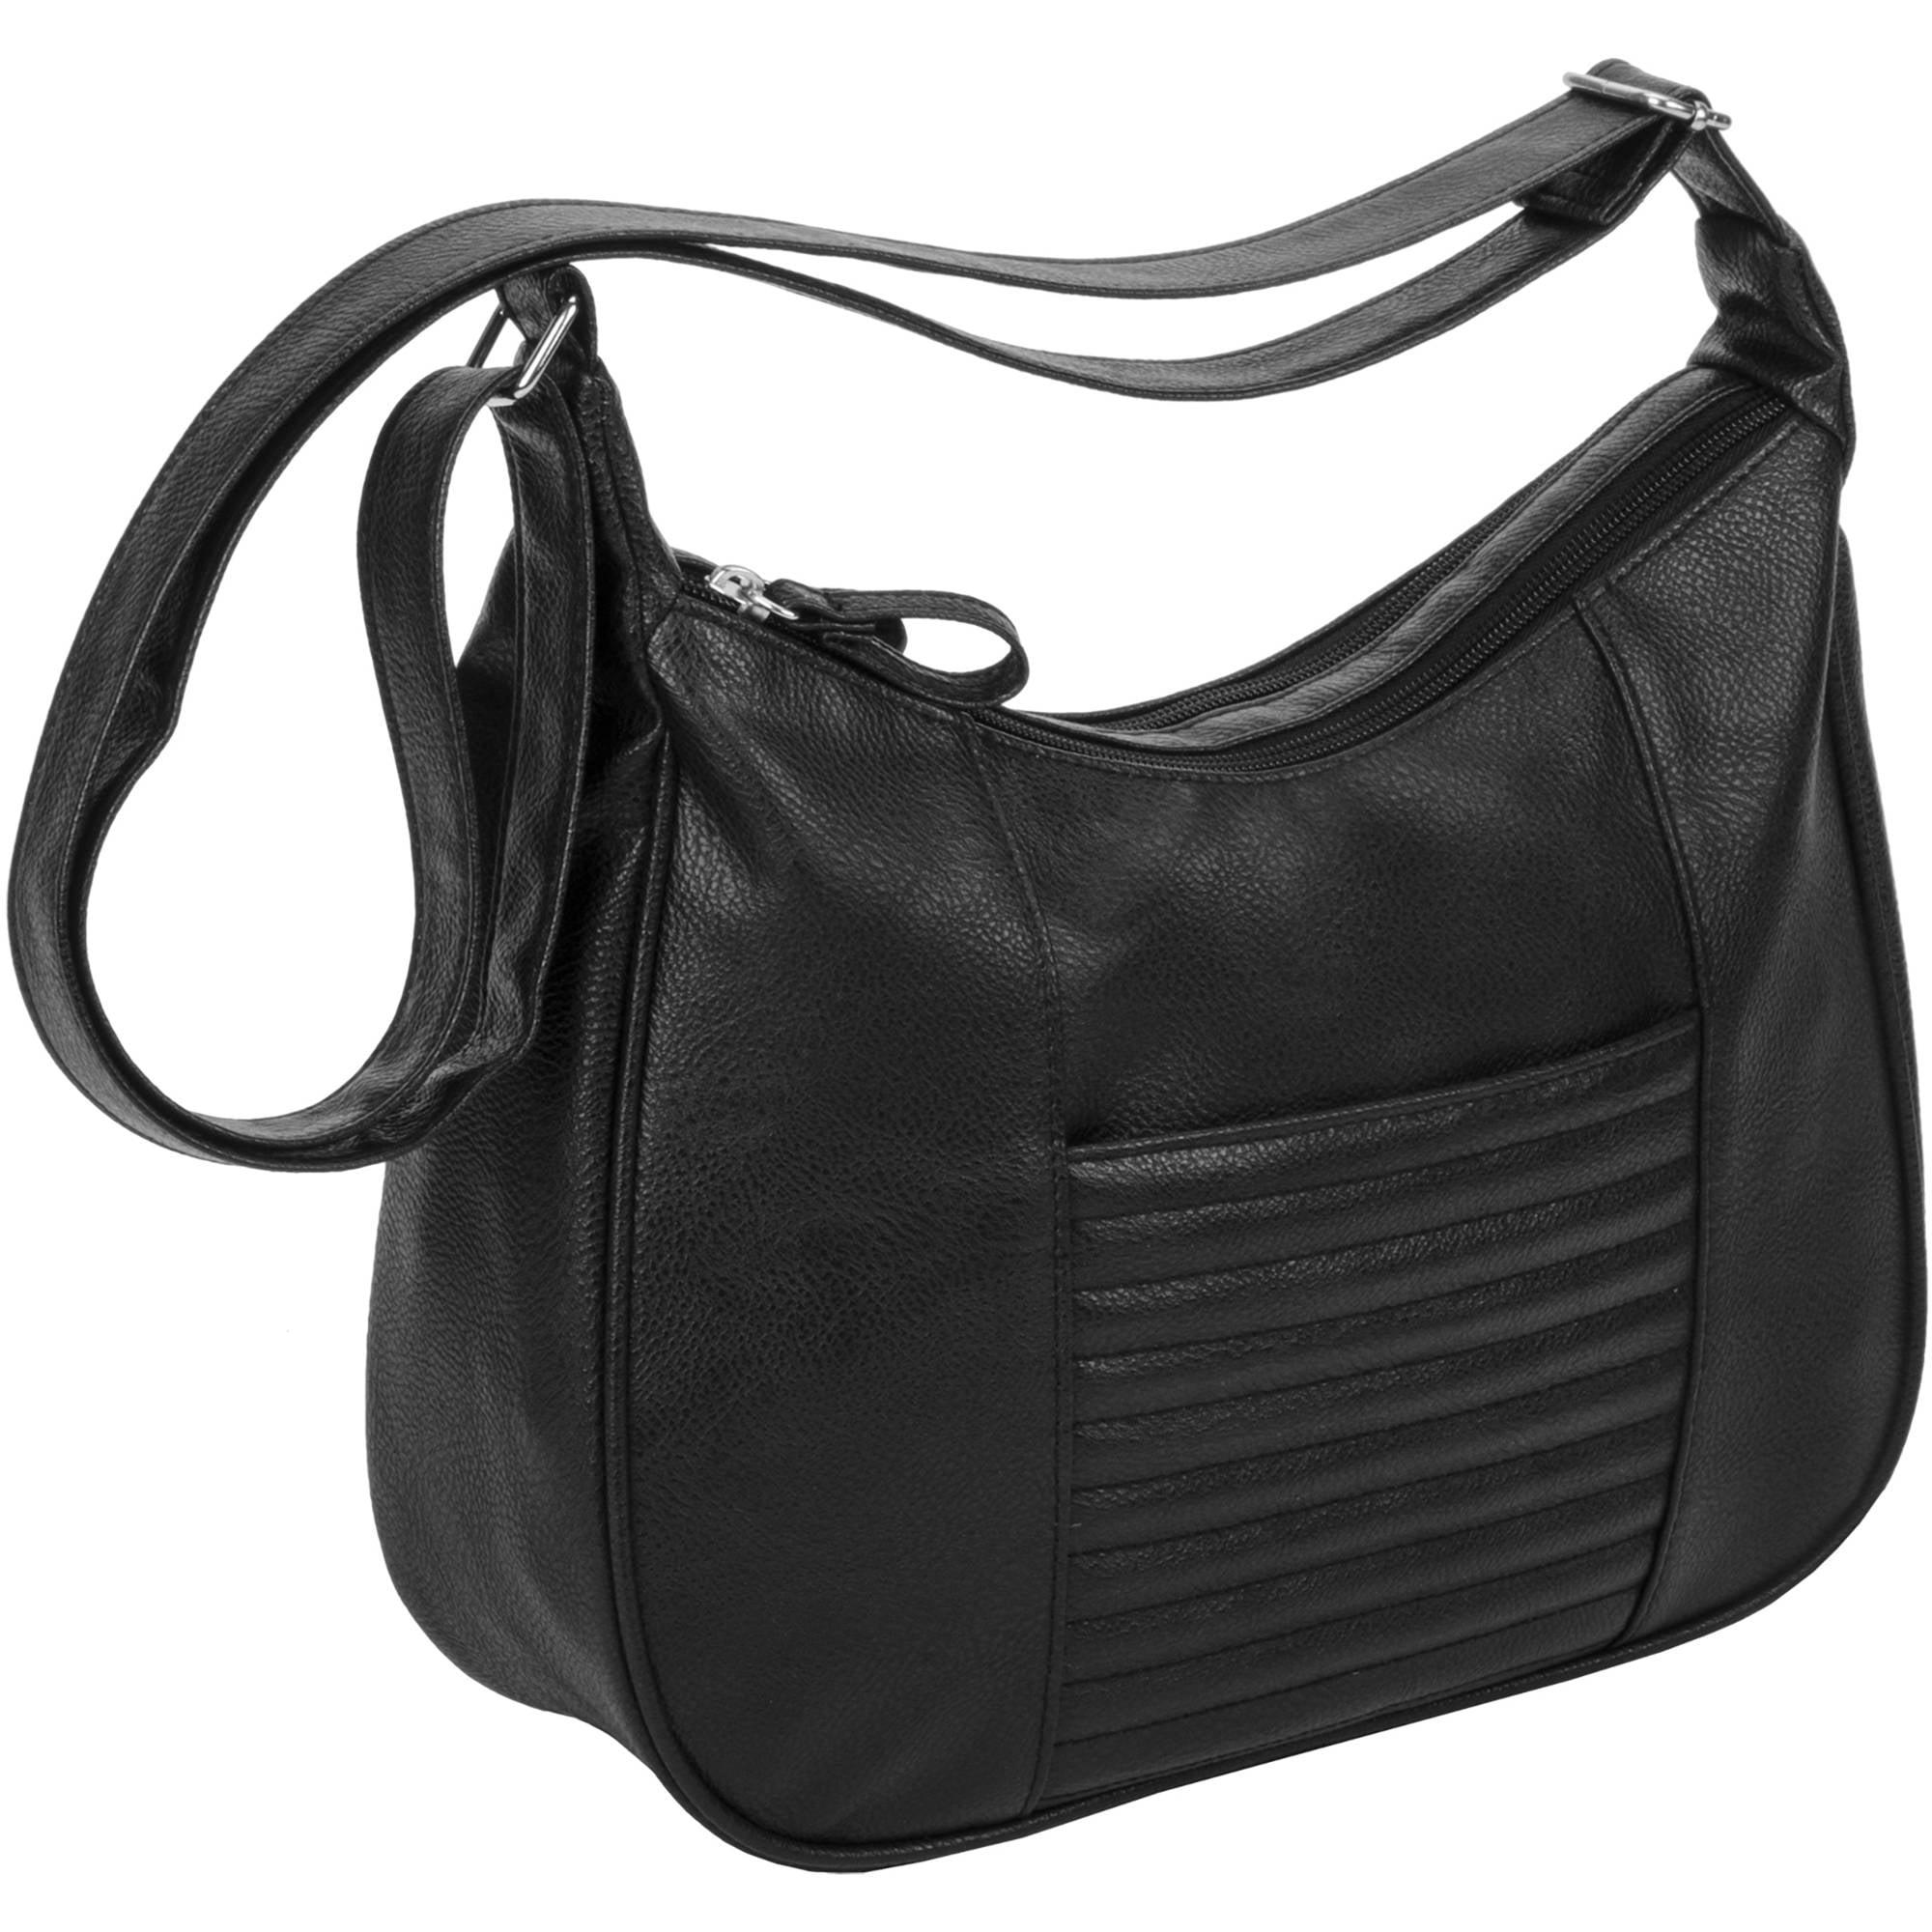 Women's Quilted Crossbody Hobo Handbag with Adjustable Strap